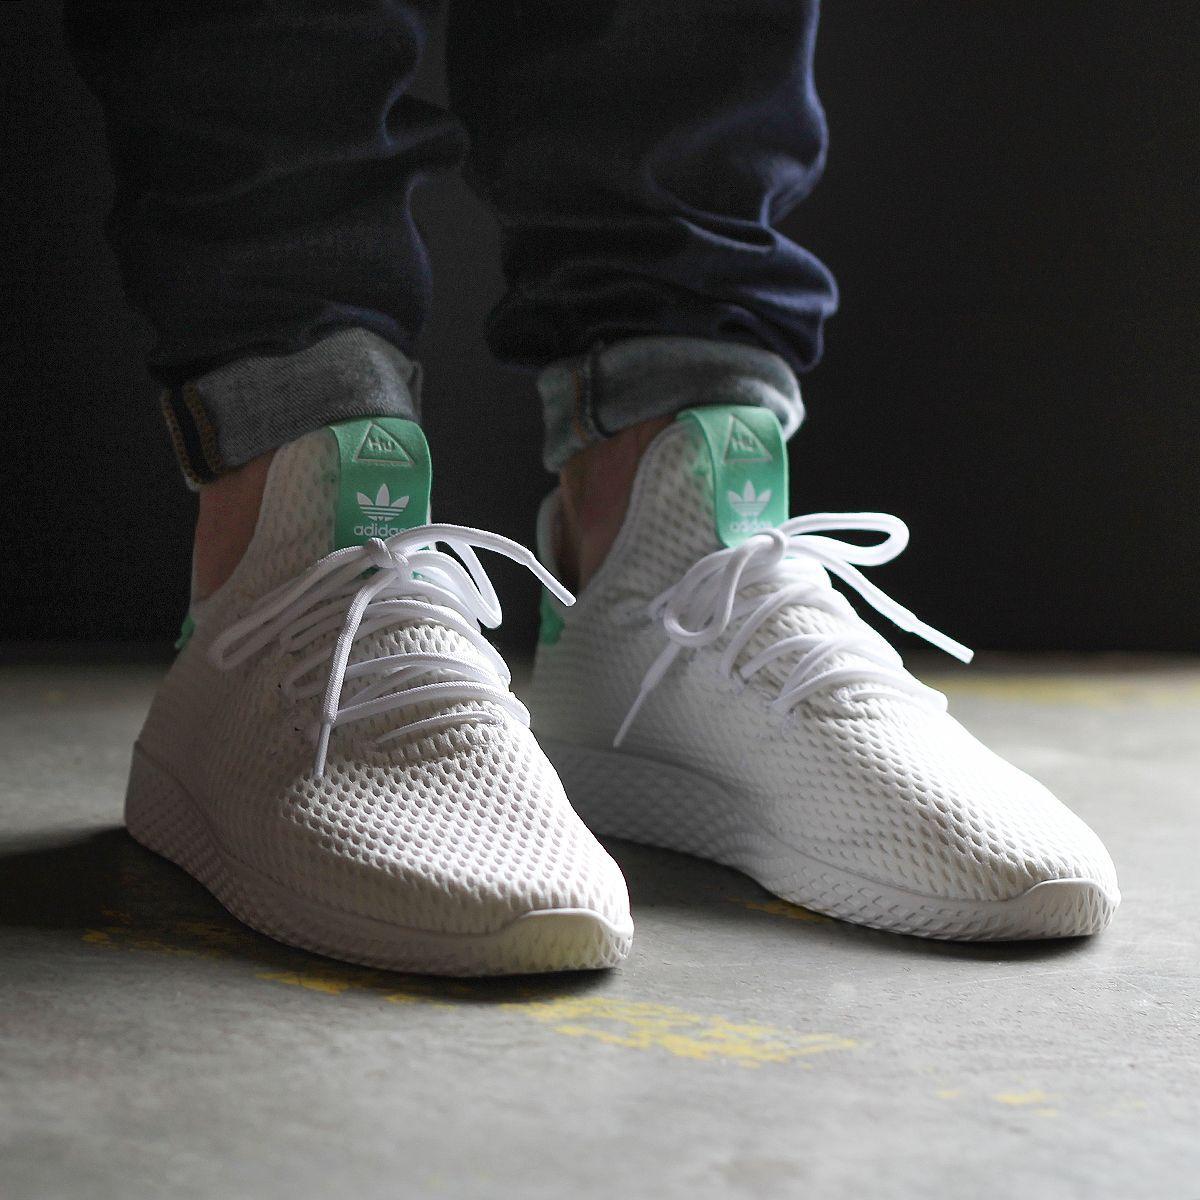 Adidas Originals X Pharrell Williams Hu Shoes Sneakers Shoes Sneakers Adidas Sneakers Men Fashion Sneakers